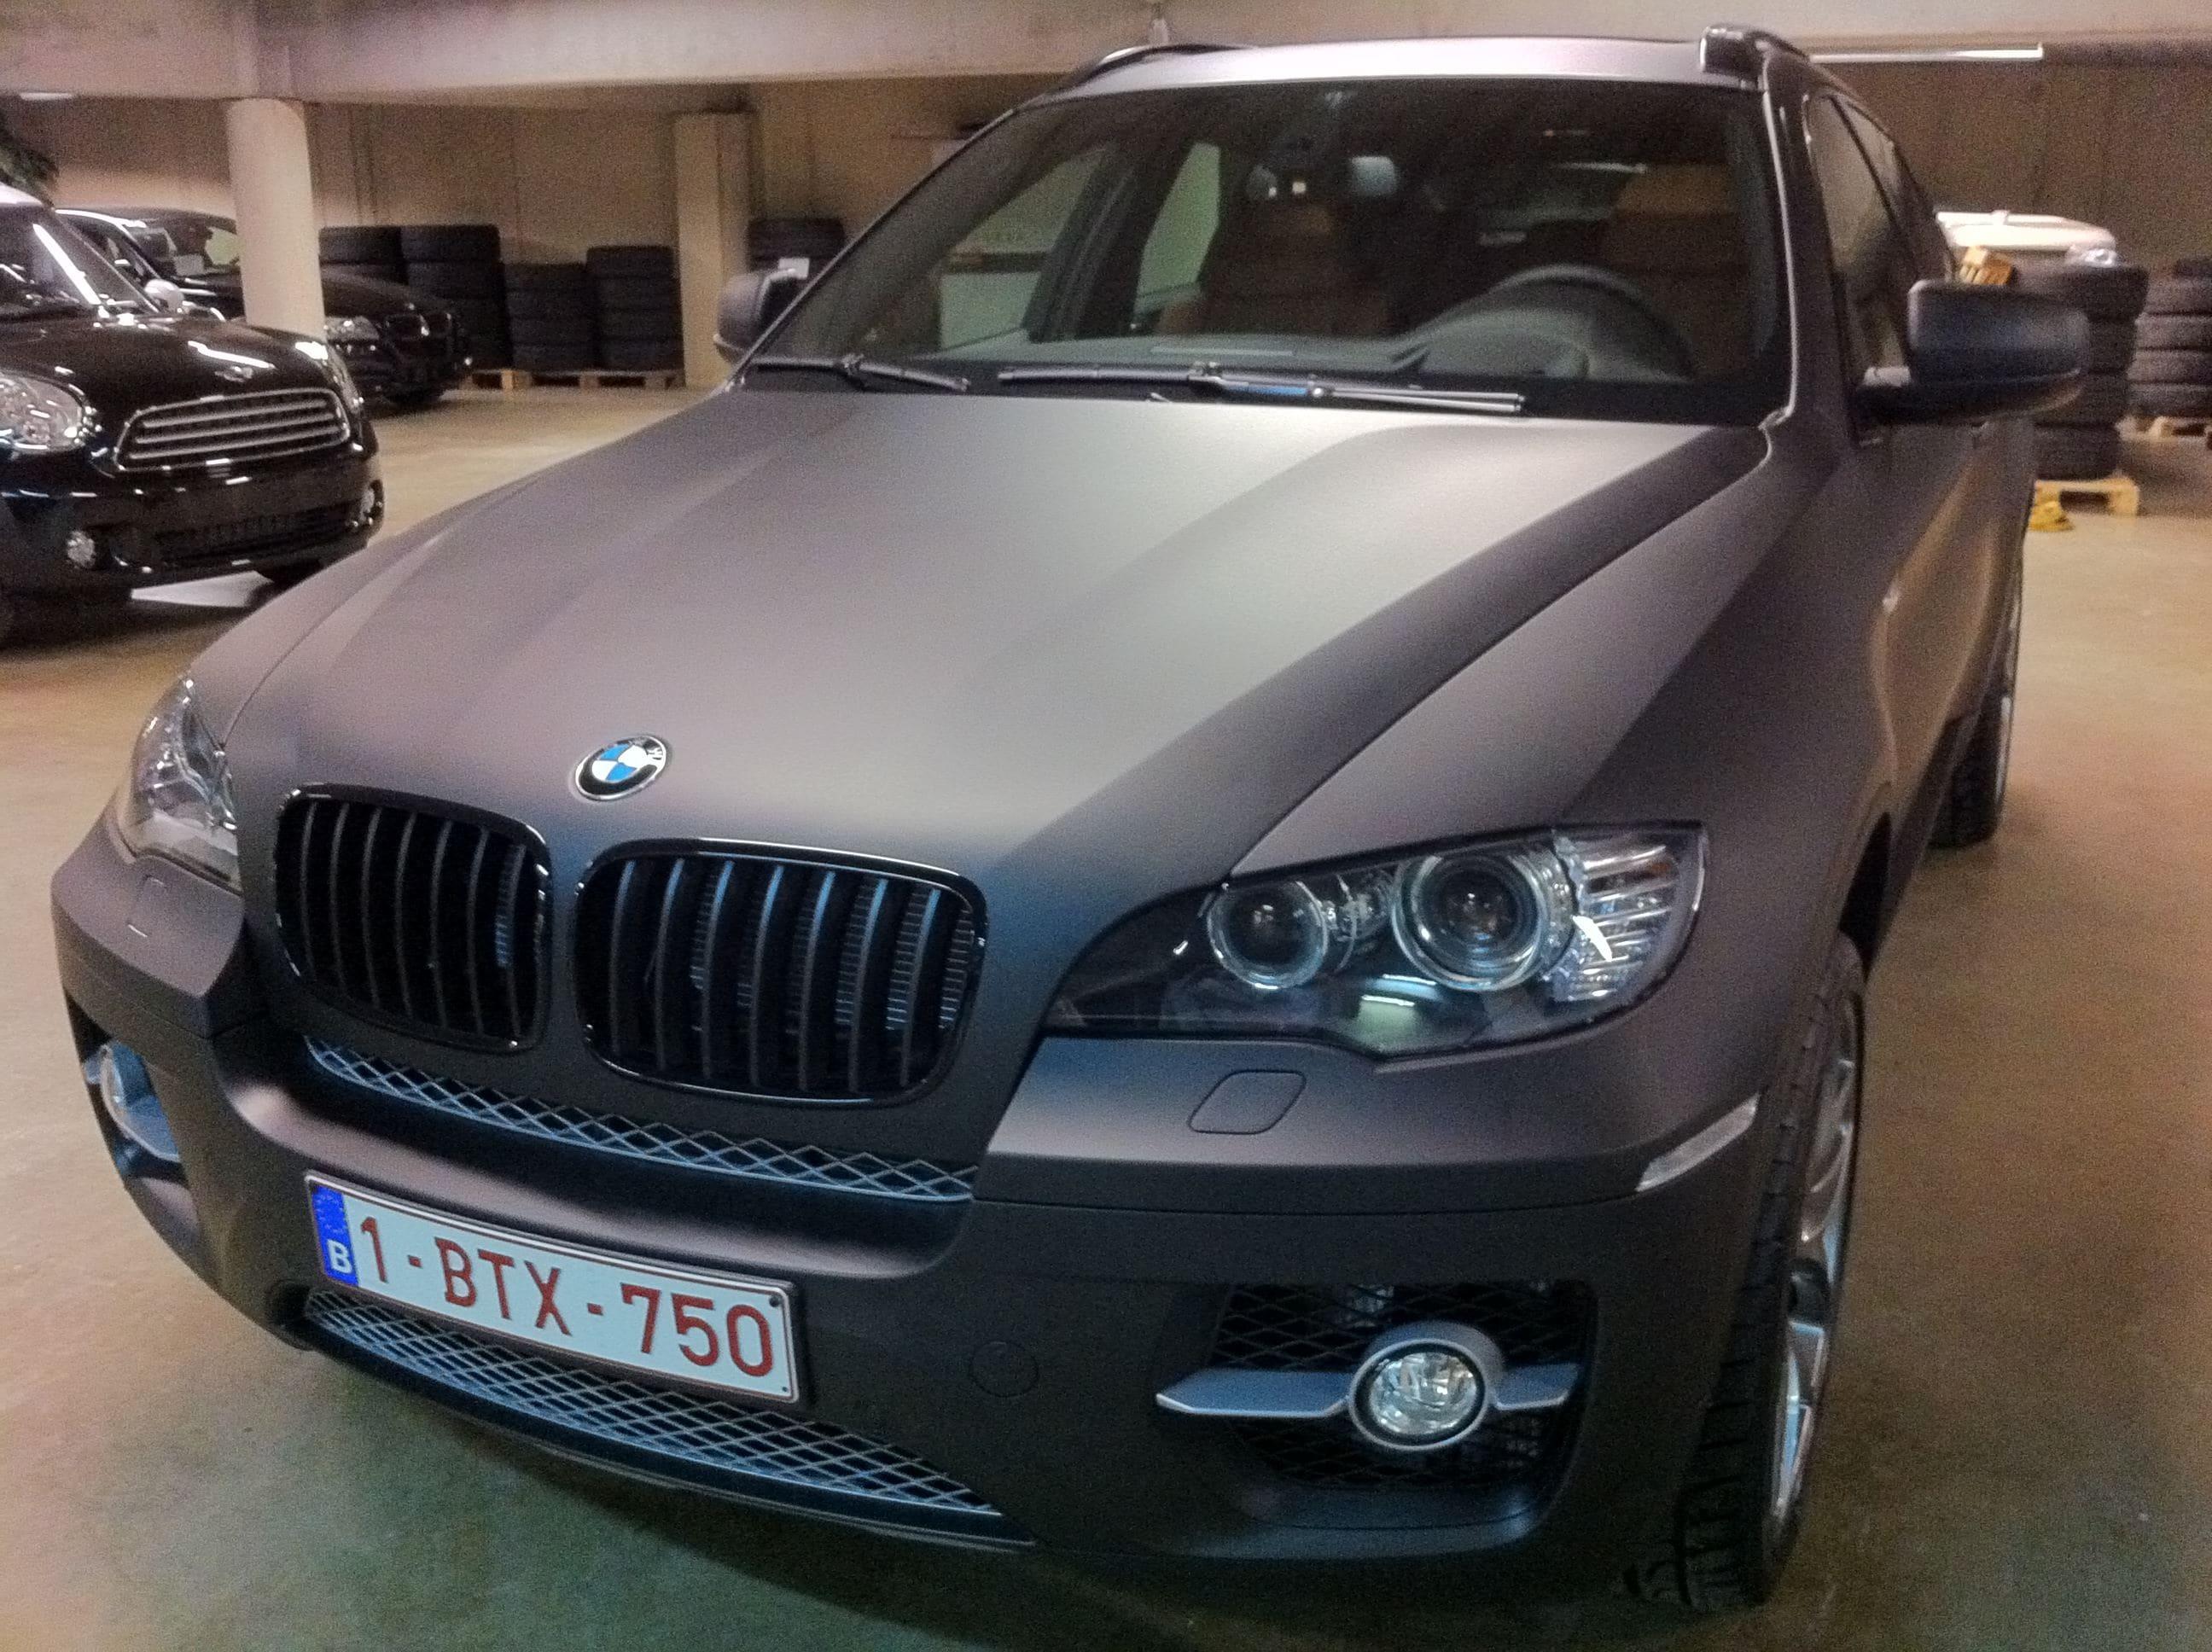 BMW X6 met Mat Zwarte Wrap, Carwrapping door Wrapmyride.nu Foto-nr:5488, ©2020